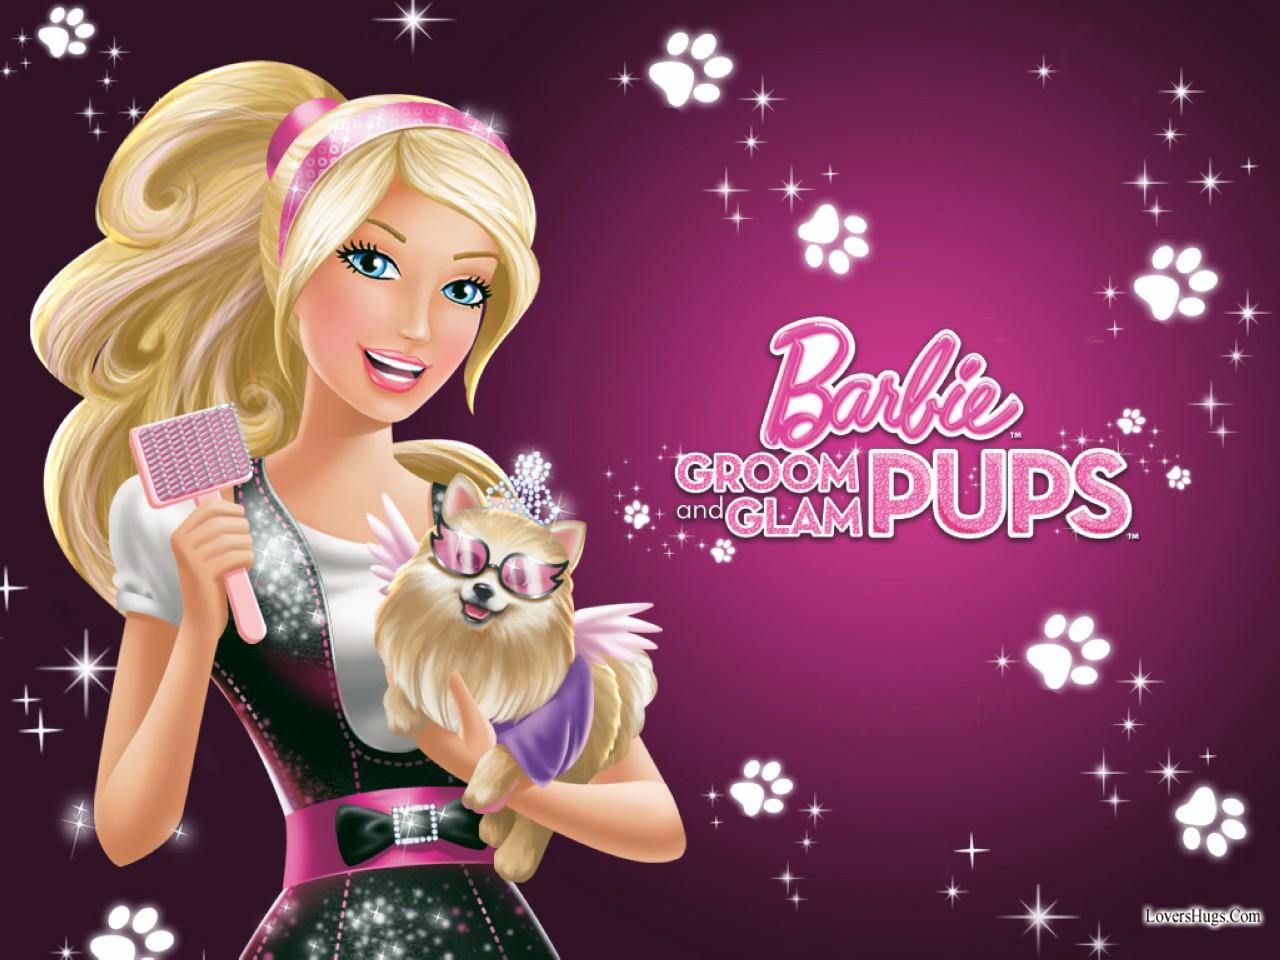 Barbie hd wallpapers wallpapersafari barbie hd wallpapers barbie hd wallpapers check out the cool latest 1280x960 voltagebd Gallery